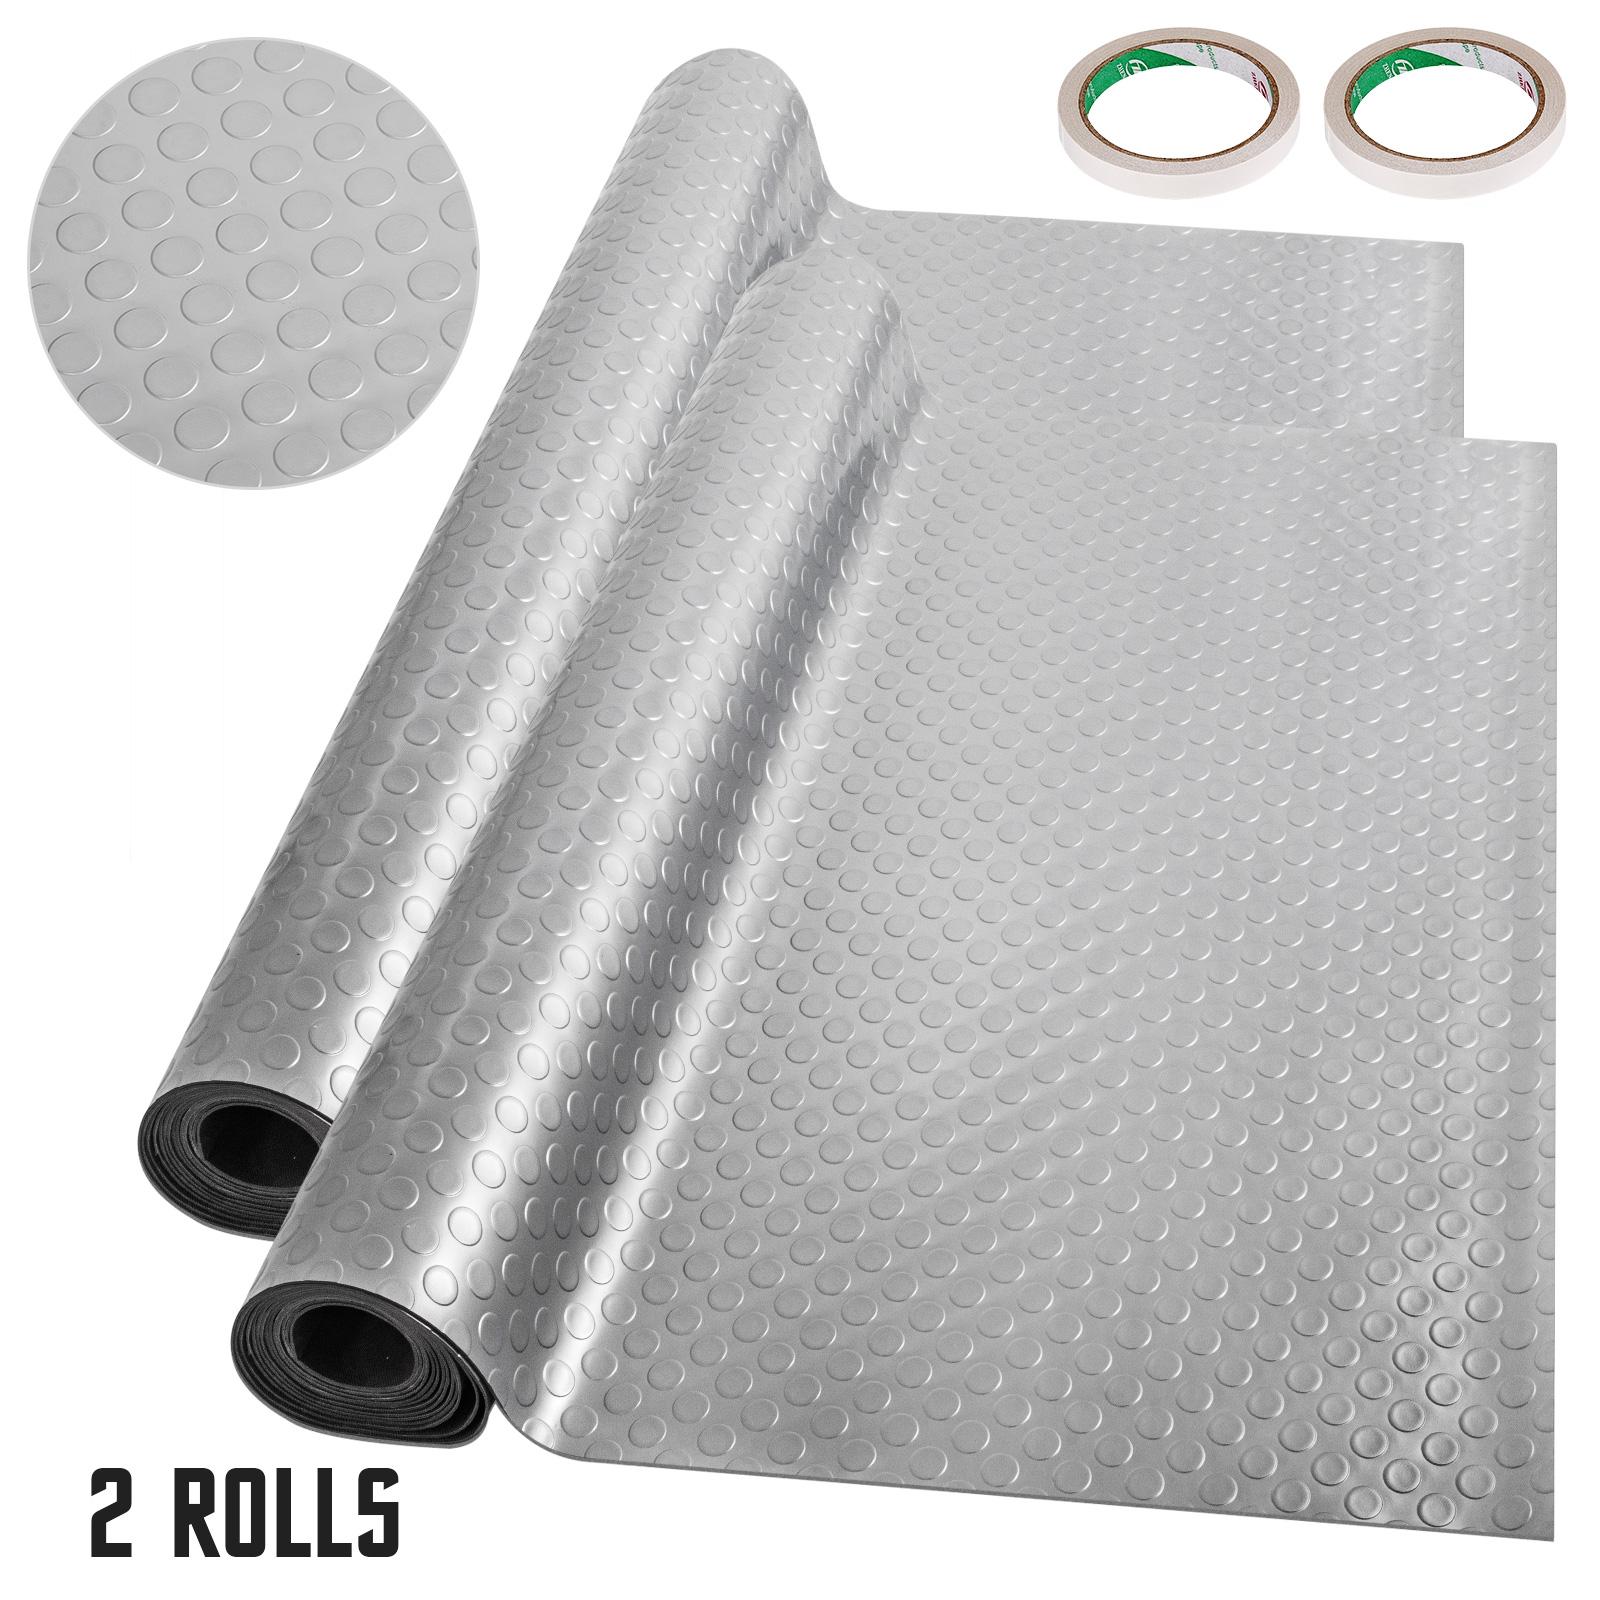 thumbnail 133 - Garage Flooring Mat Roll Car Trailer Floor Covering 1.1m Width Gym Floor Roll